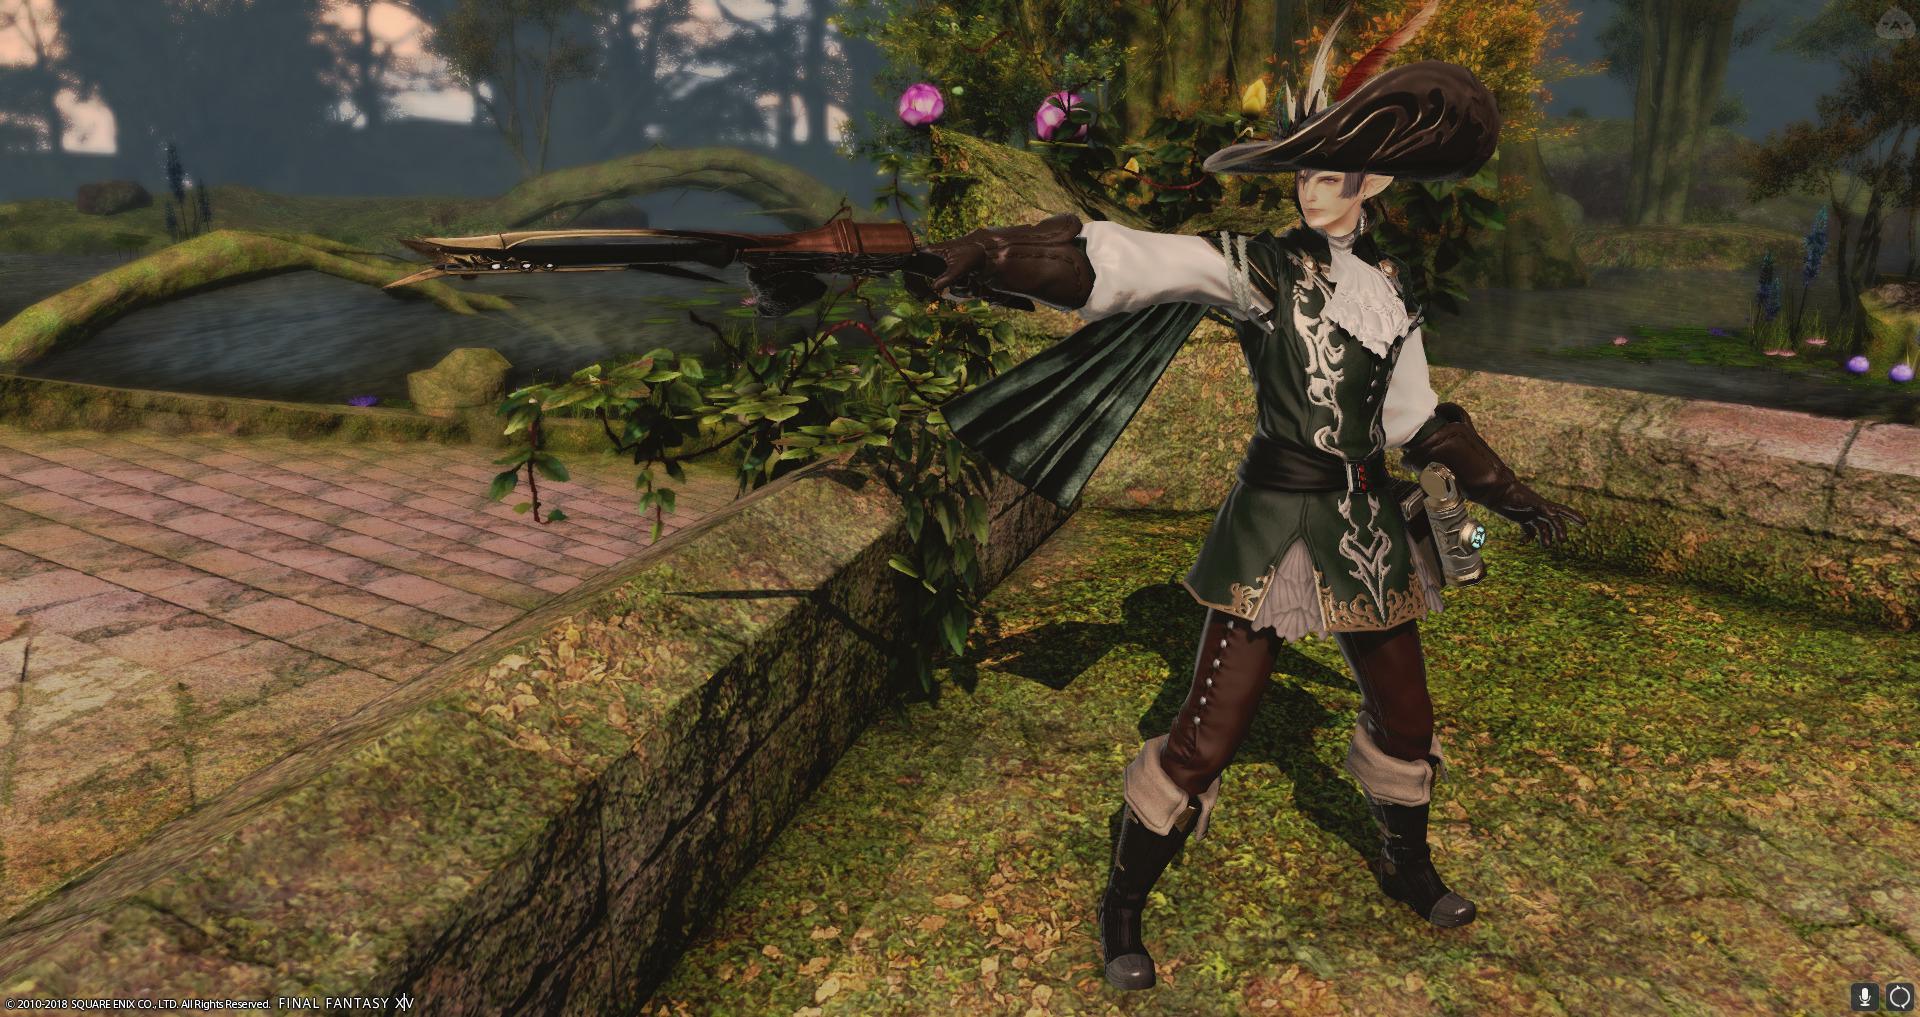 森林警護隊の銃士